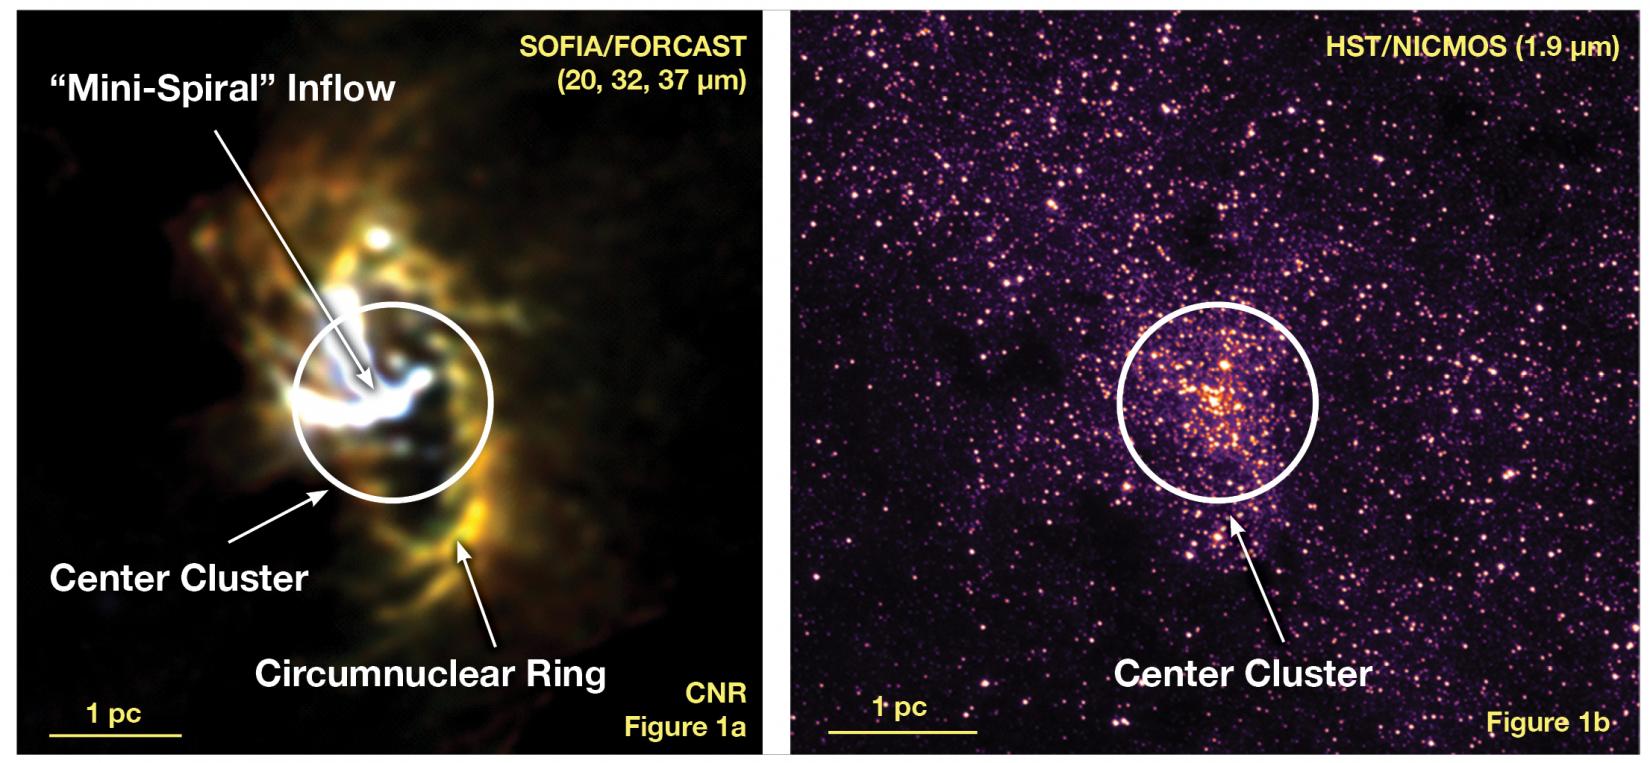 Milky Way Galaxy Circumnuclear Ring